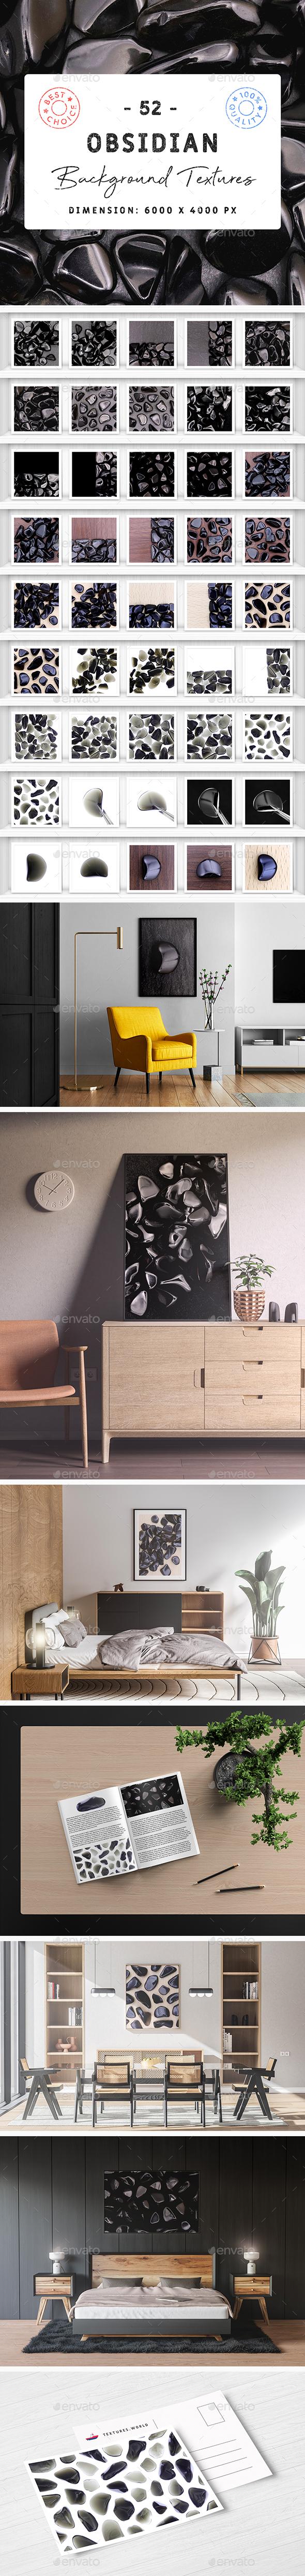 52 Obsidian Background Textures